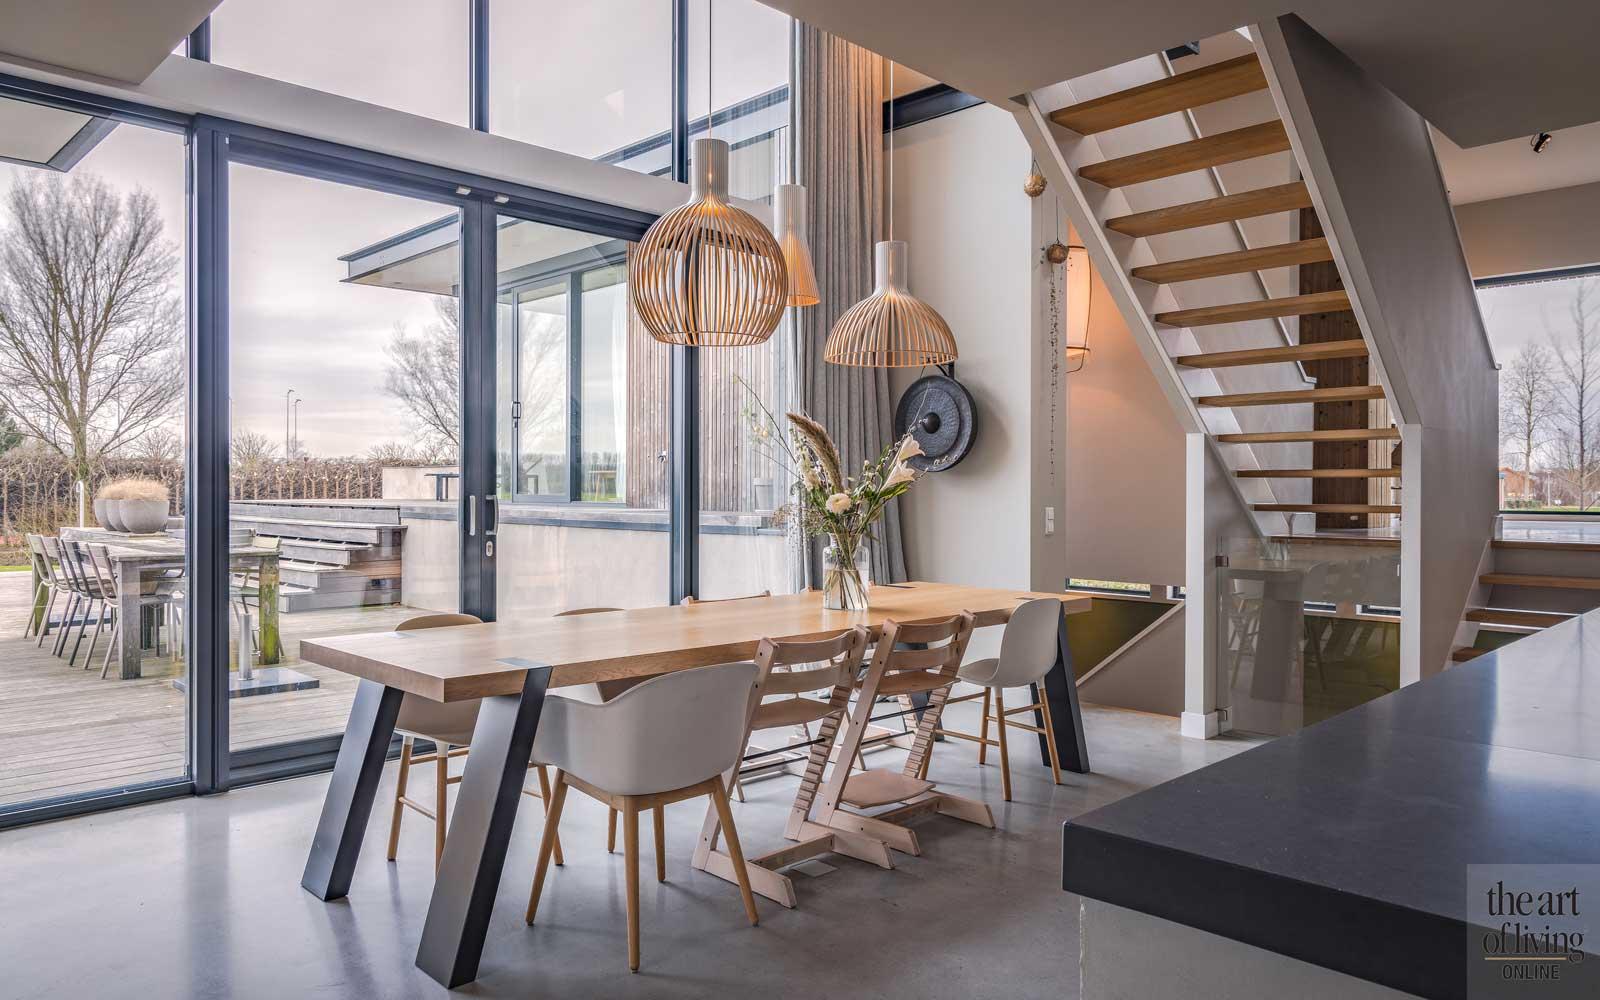 Moderne architectuur | ZILT architecten, the art of living